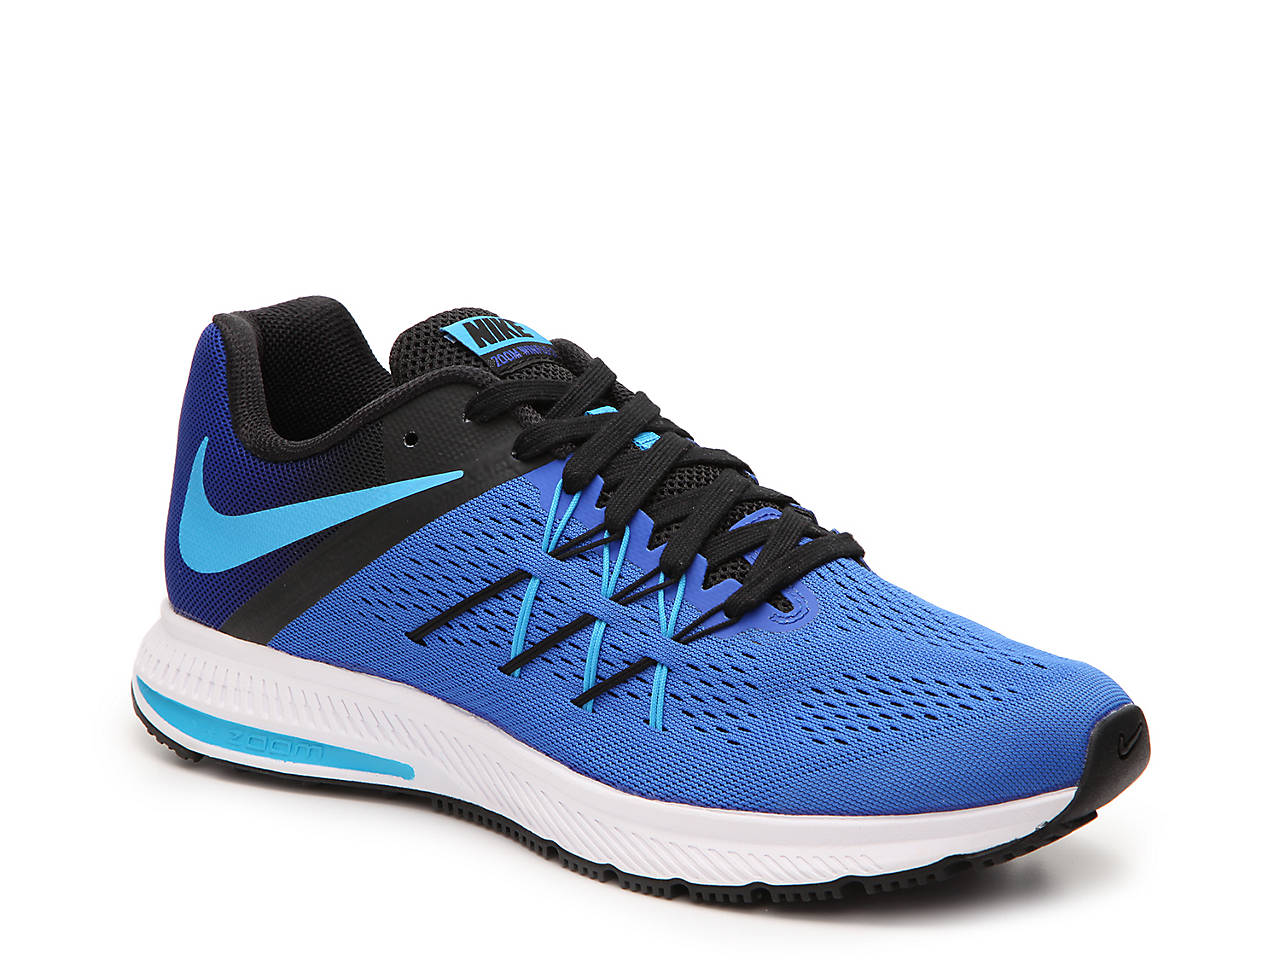 688f94610855b Nike Zoom Winflo 3 Lightweight Running Shoe - Men s Men s Shoes